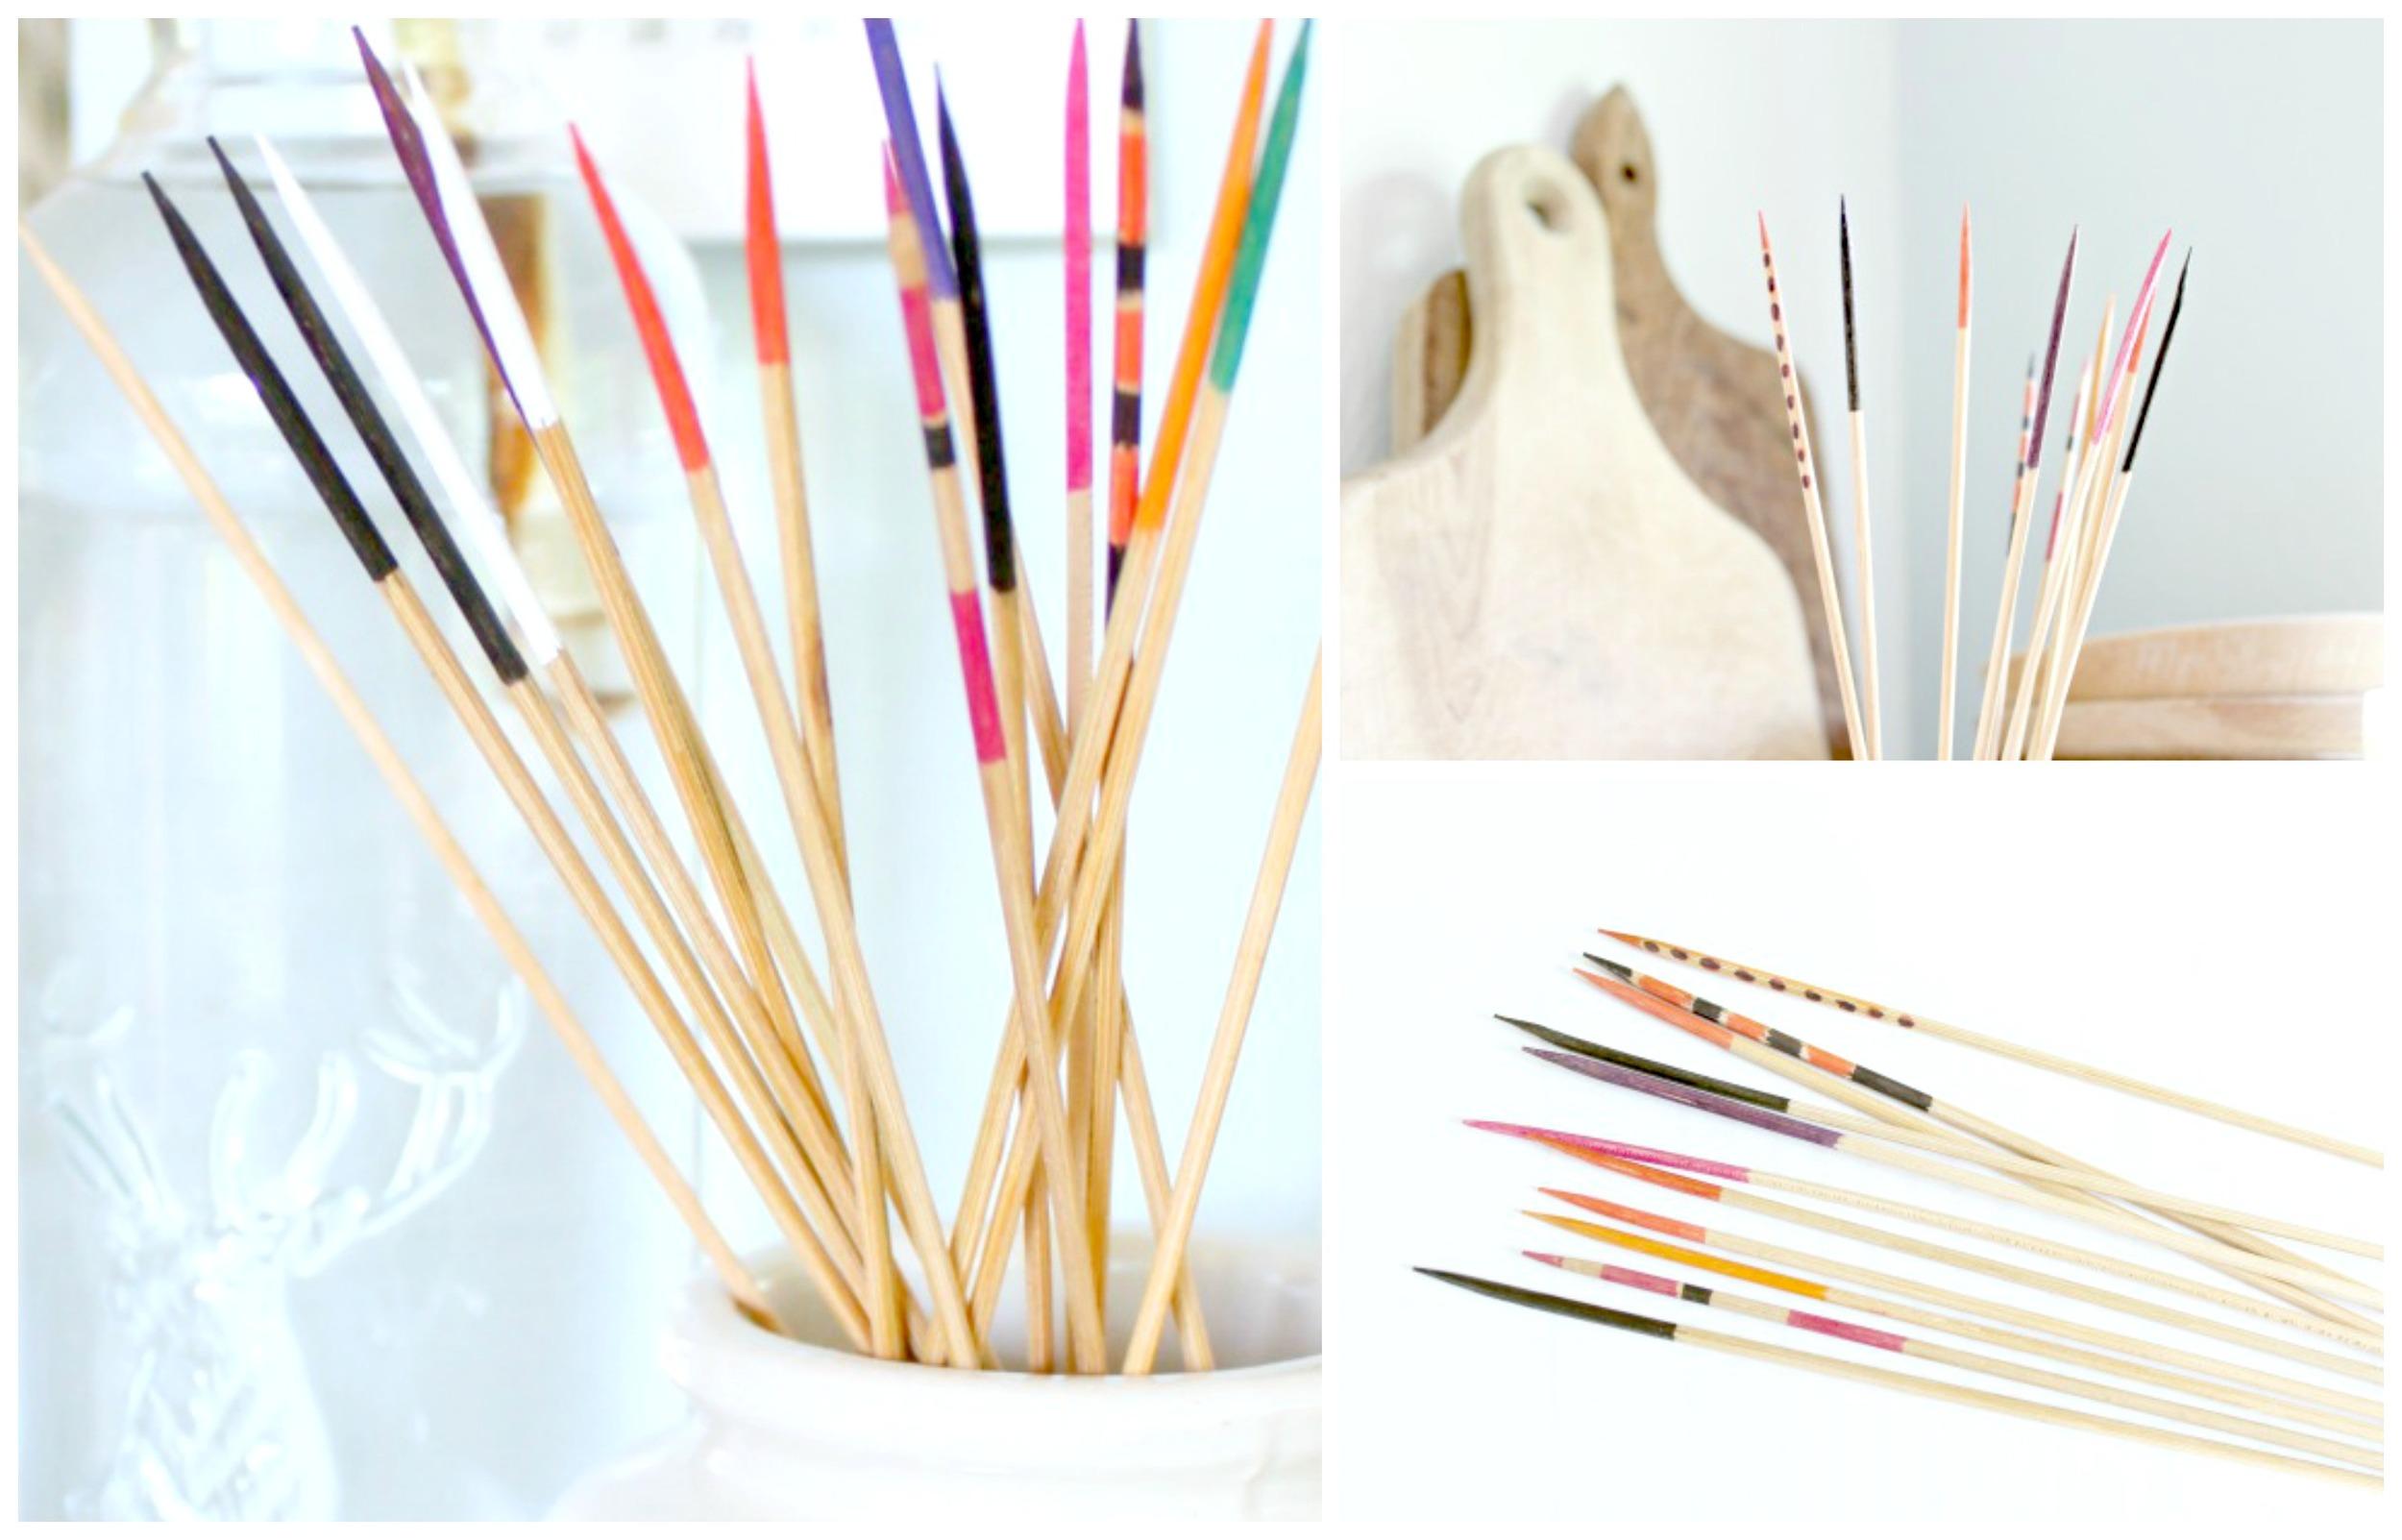 Color-dipped wood sticks DIY